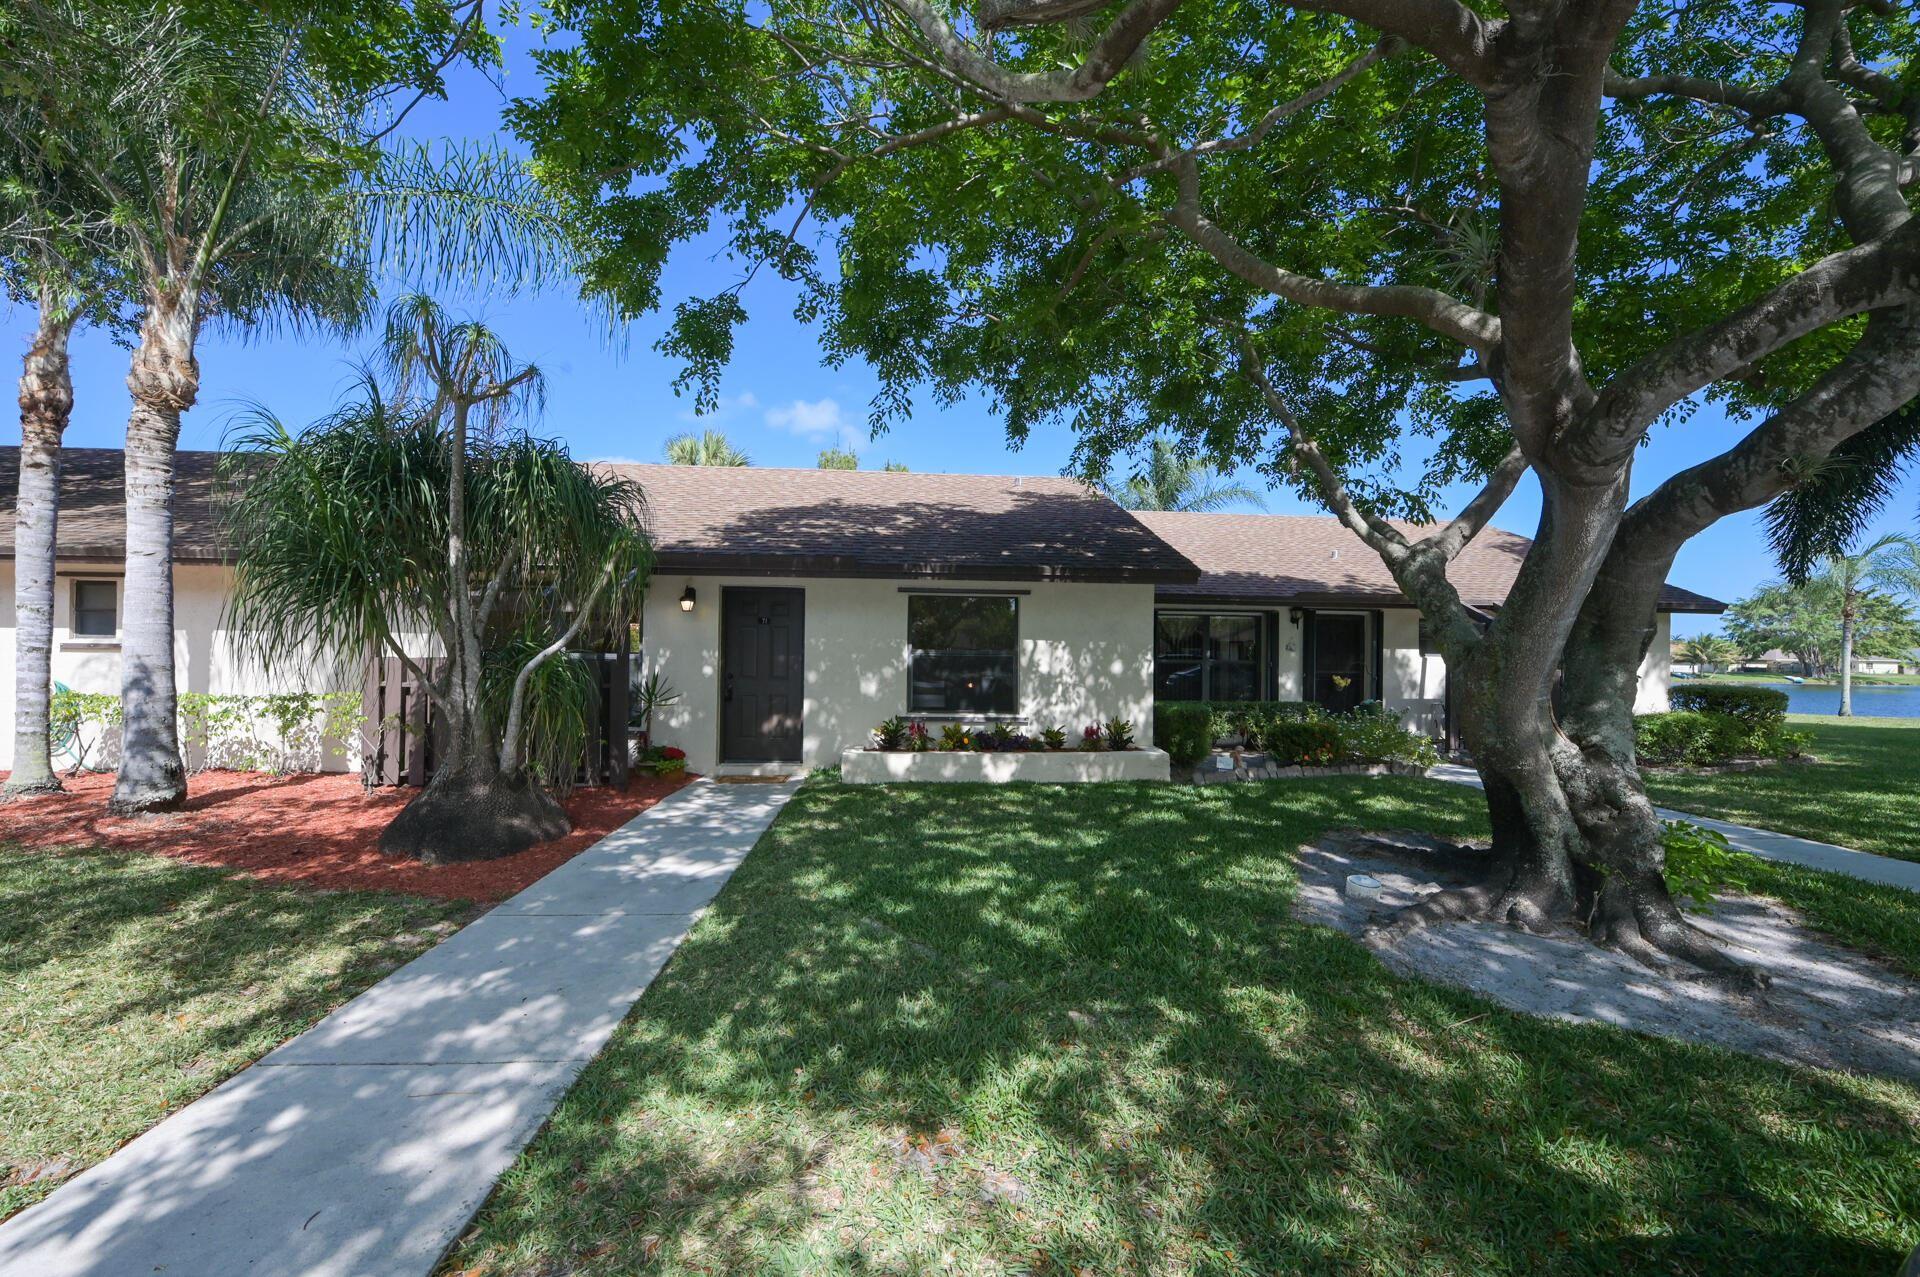 71 Via De Casas Norte, Boynton Beach, FL 33426 - MLS#: RX-10712440